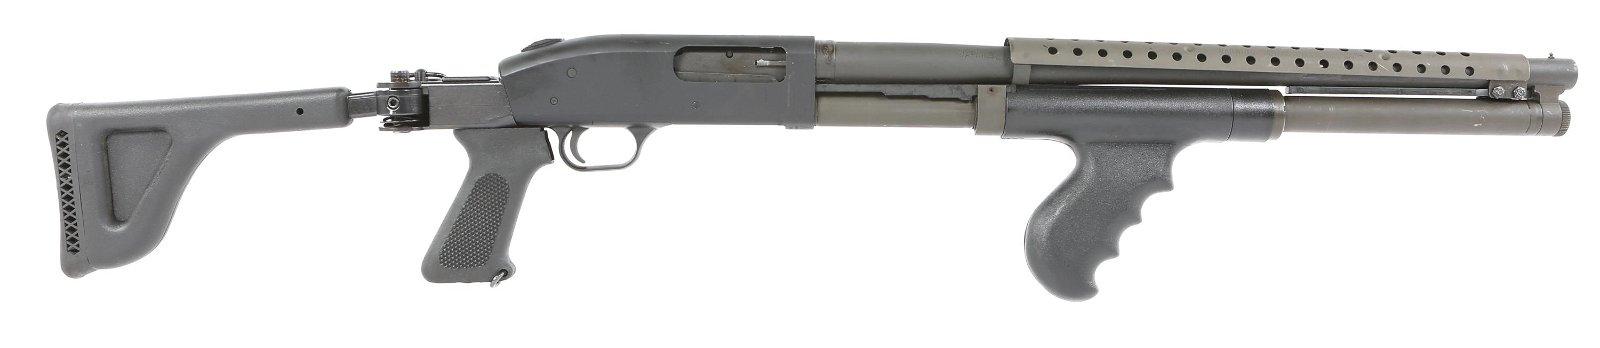 MOSSBERG MODEL 500A 12 GAUGE FOLDING STOCK SHOTGUN